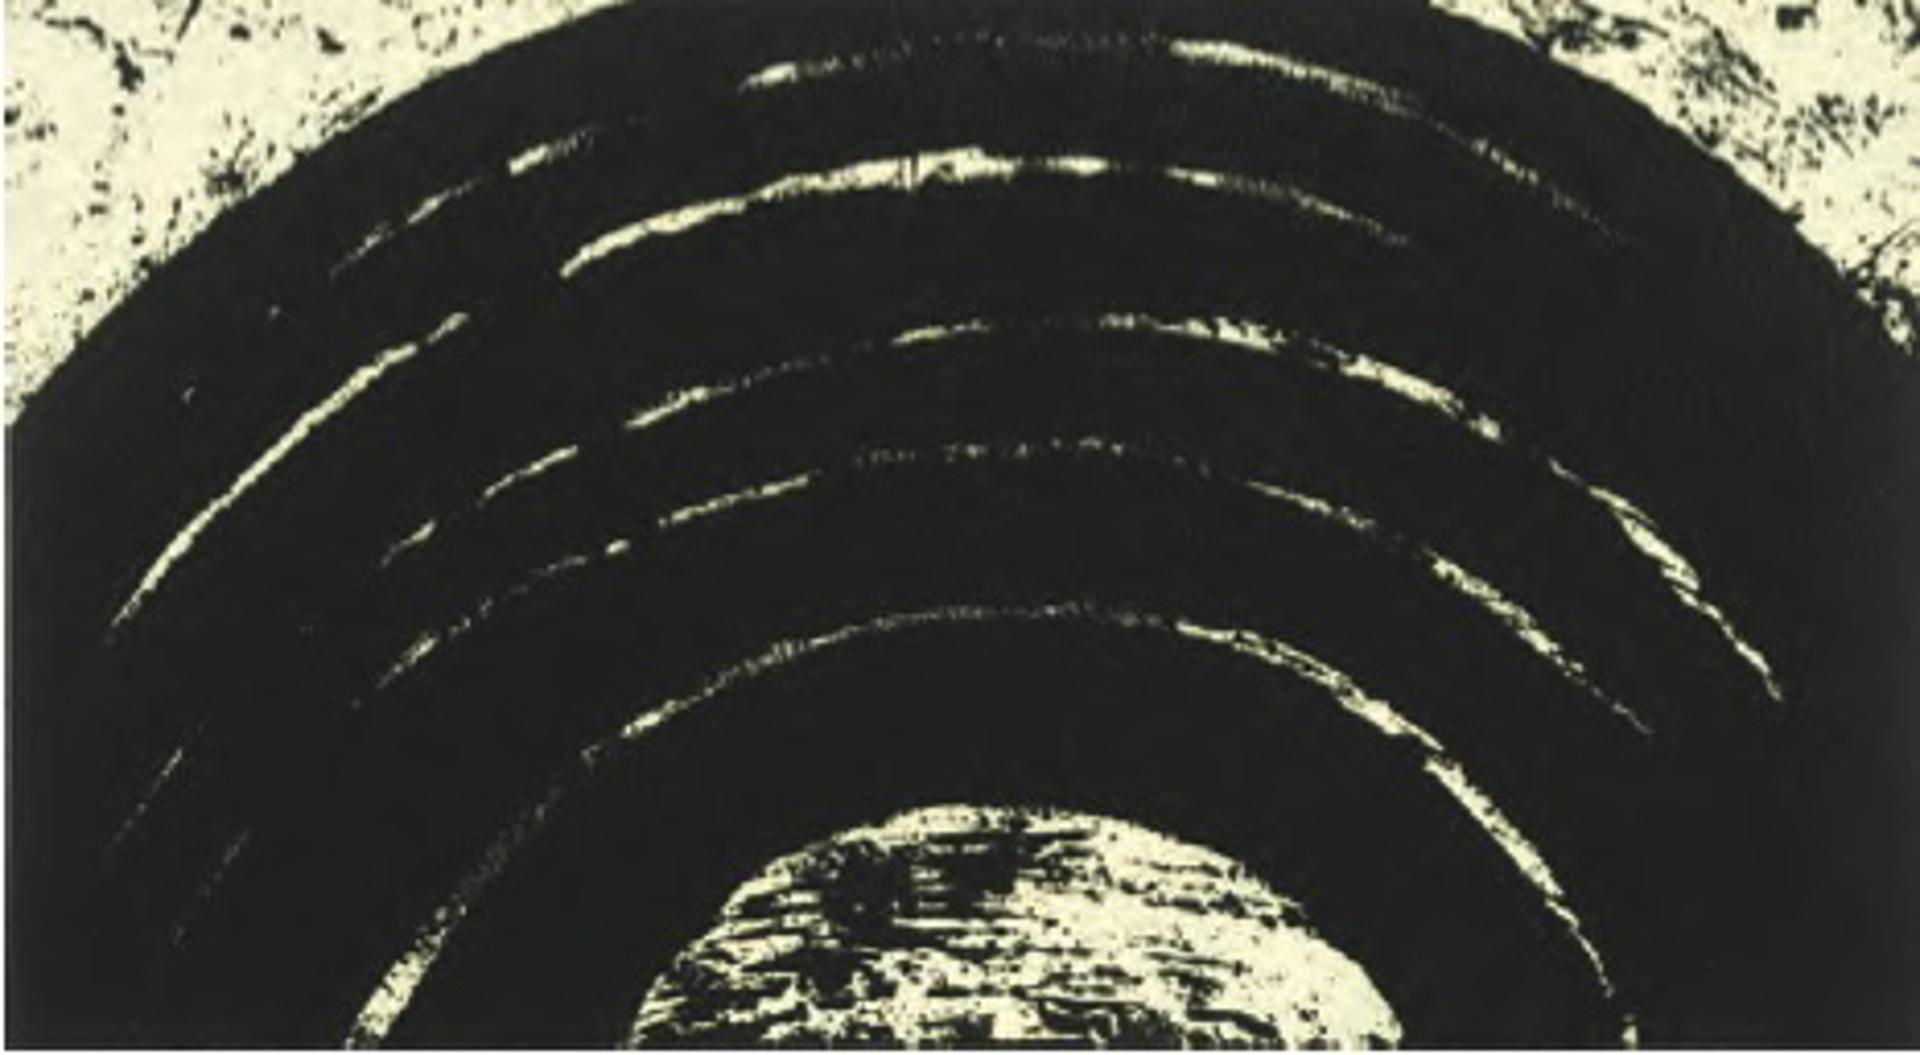 Paths and Edges #4 by Richard Serra